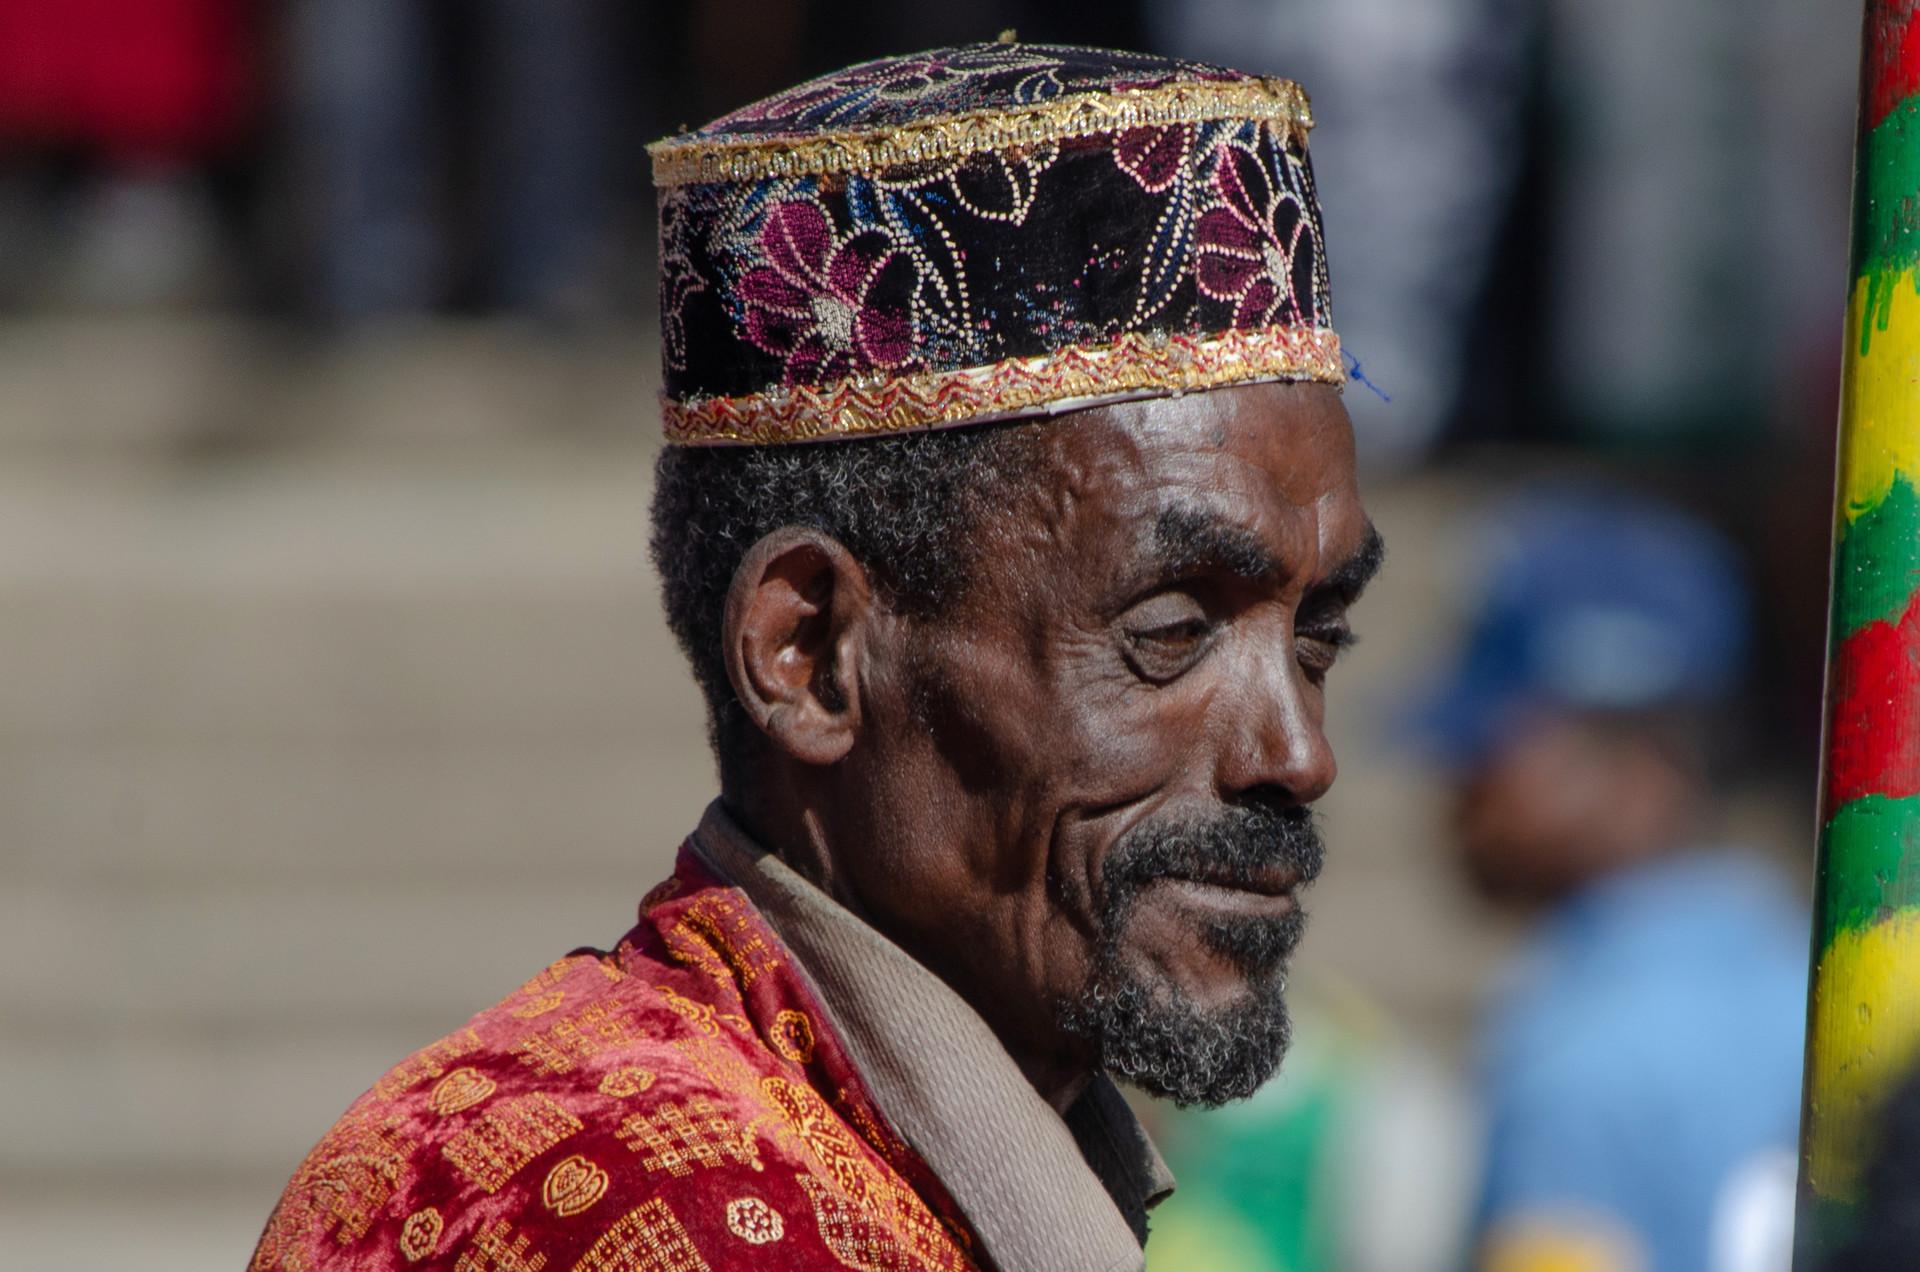 Timkat Addis Ababa 2019 CordBruegmann_07